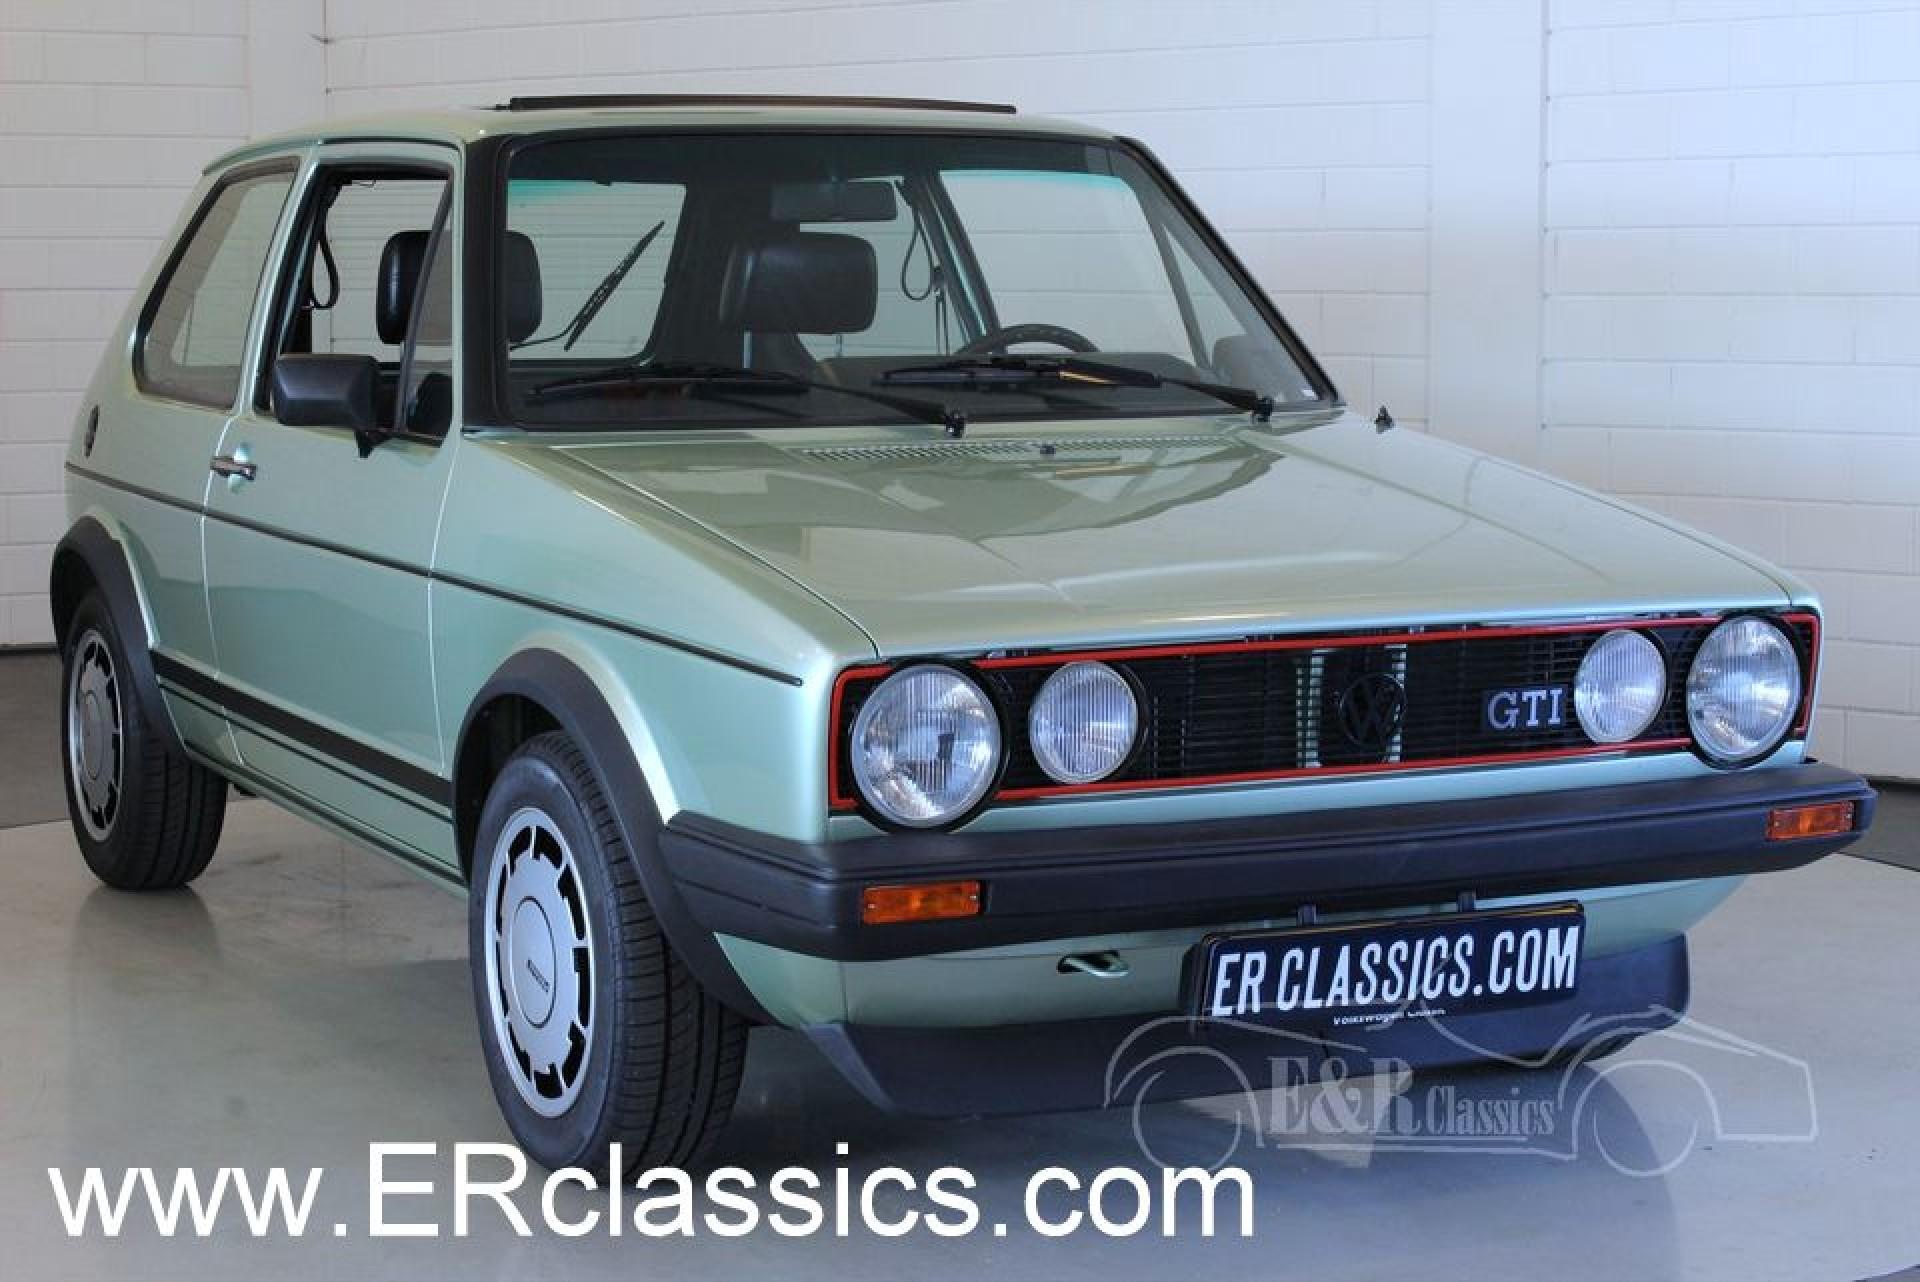 Volkswagen Golf Gti Mki 1981 For Sale At Erclassics